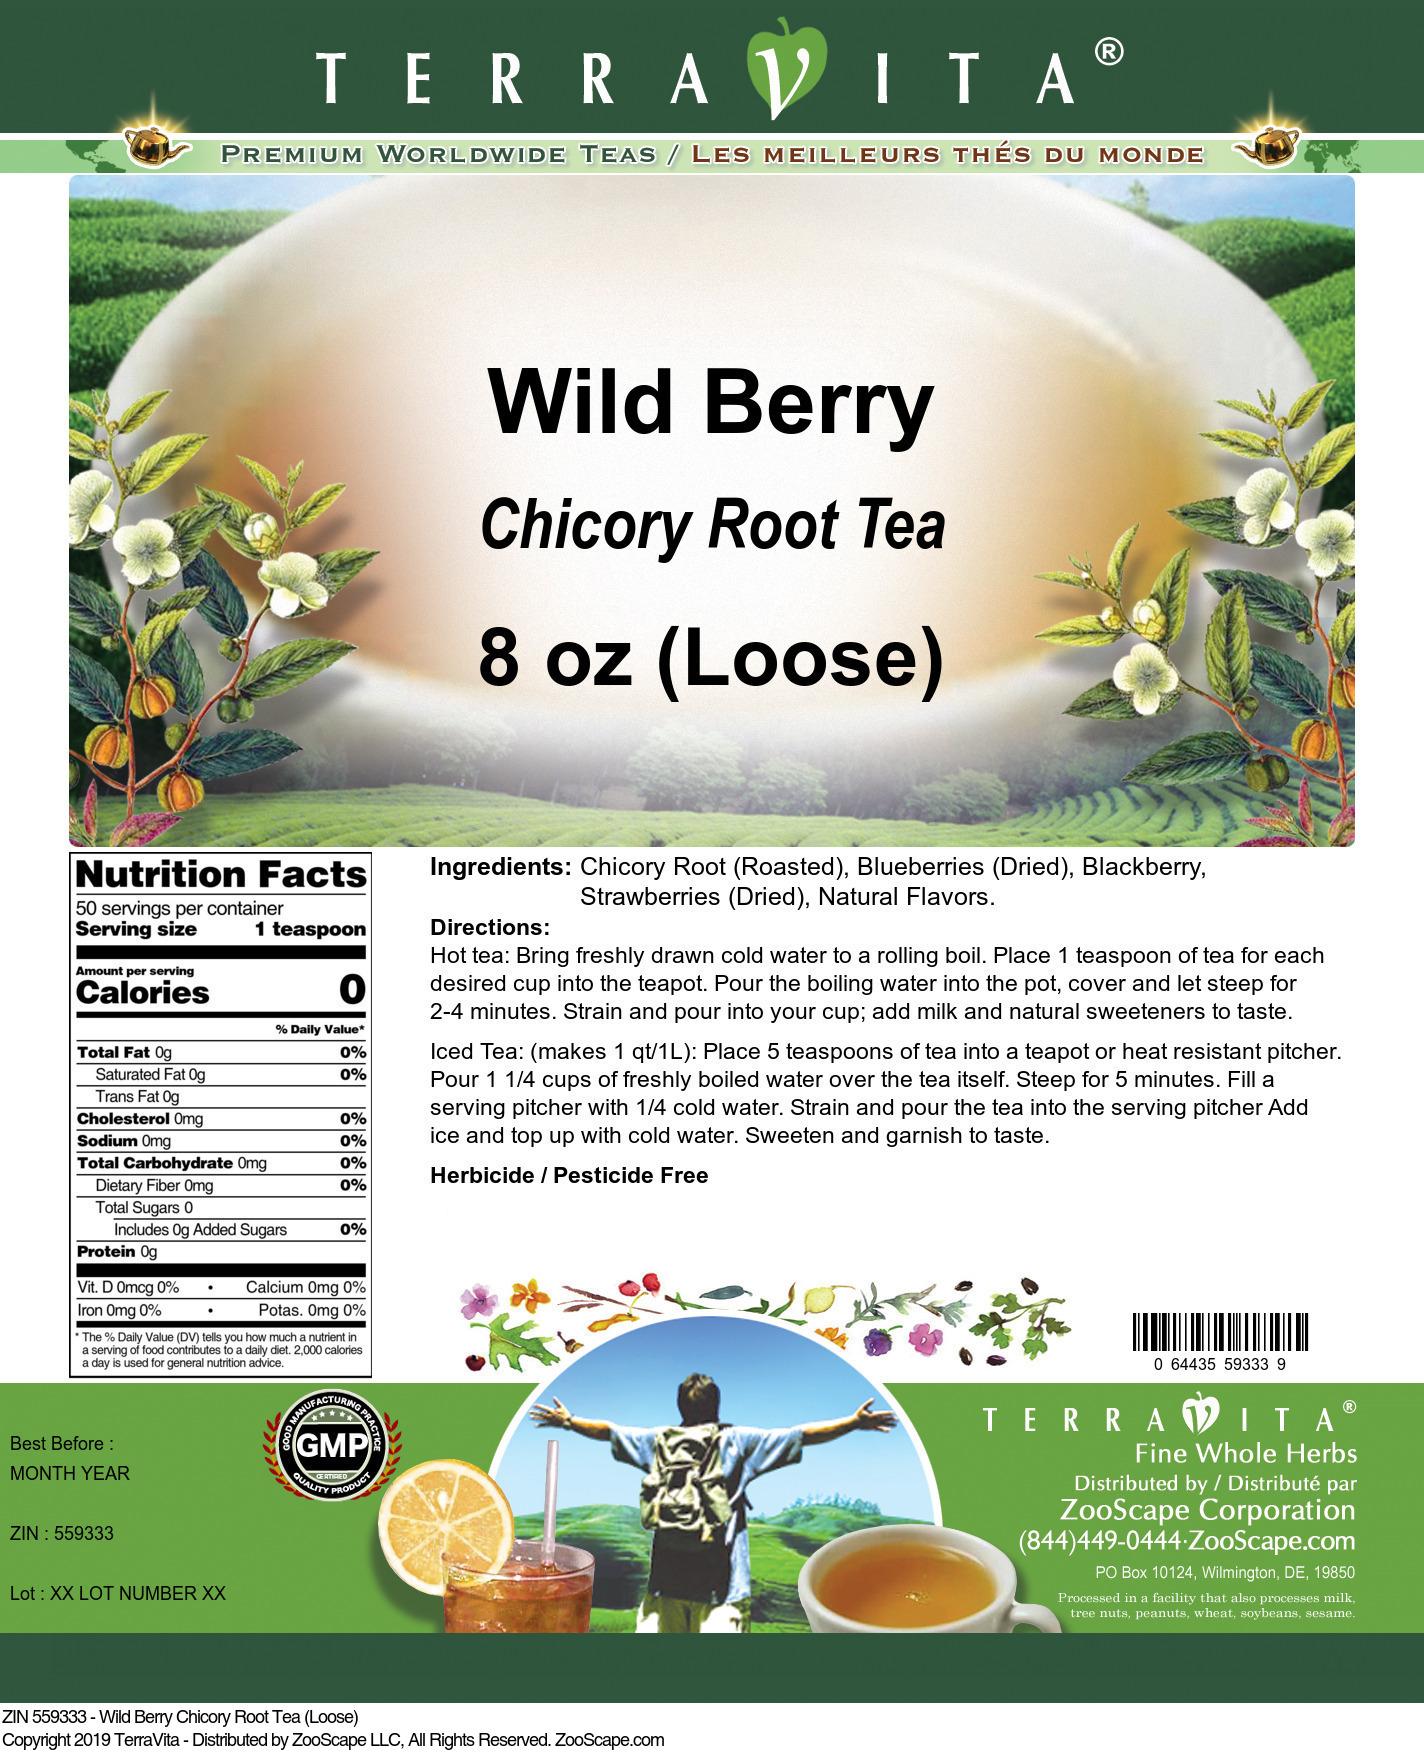 Wild Berry Chicory Root Tea (Loose)